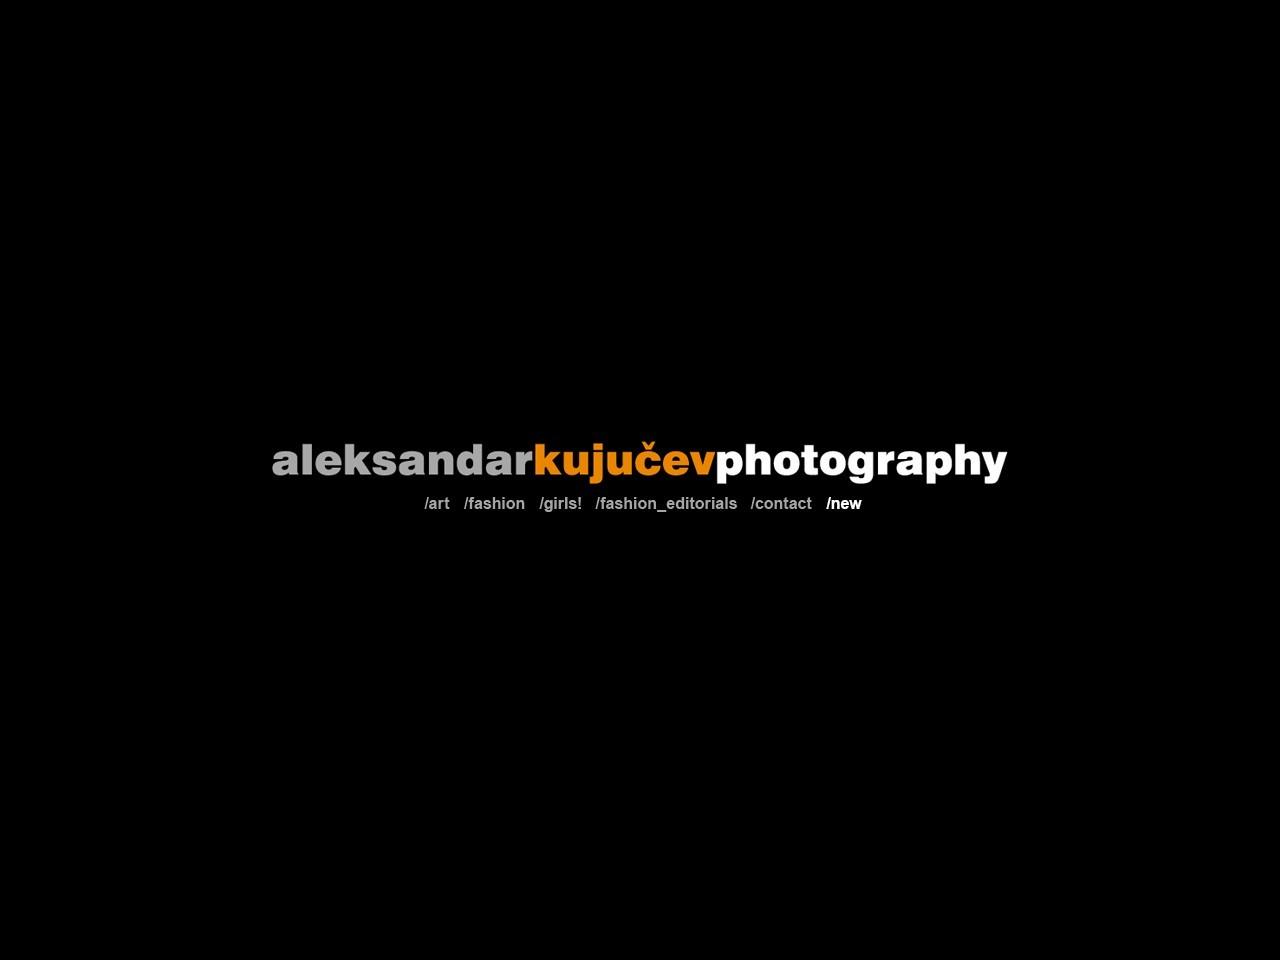 Kujucev Aleksandar Kujucev Photography